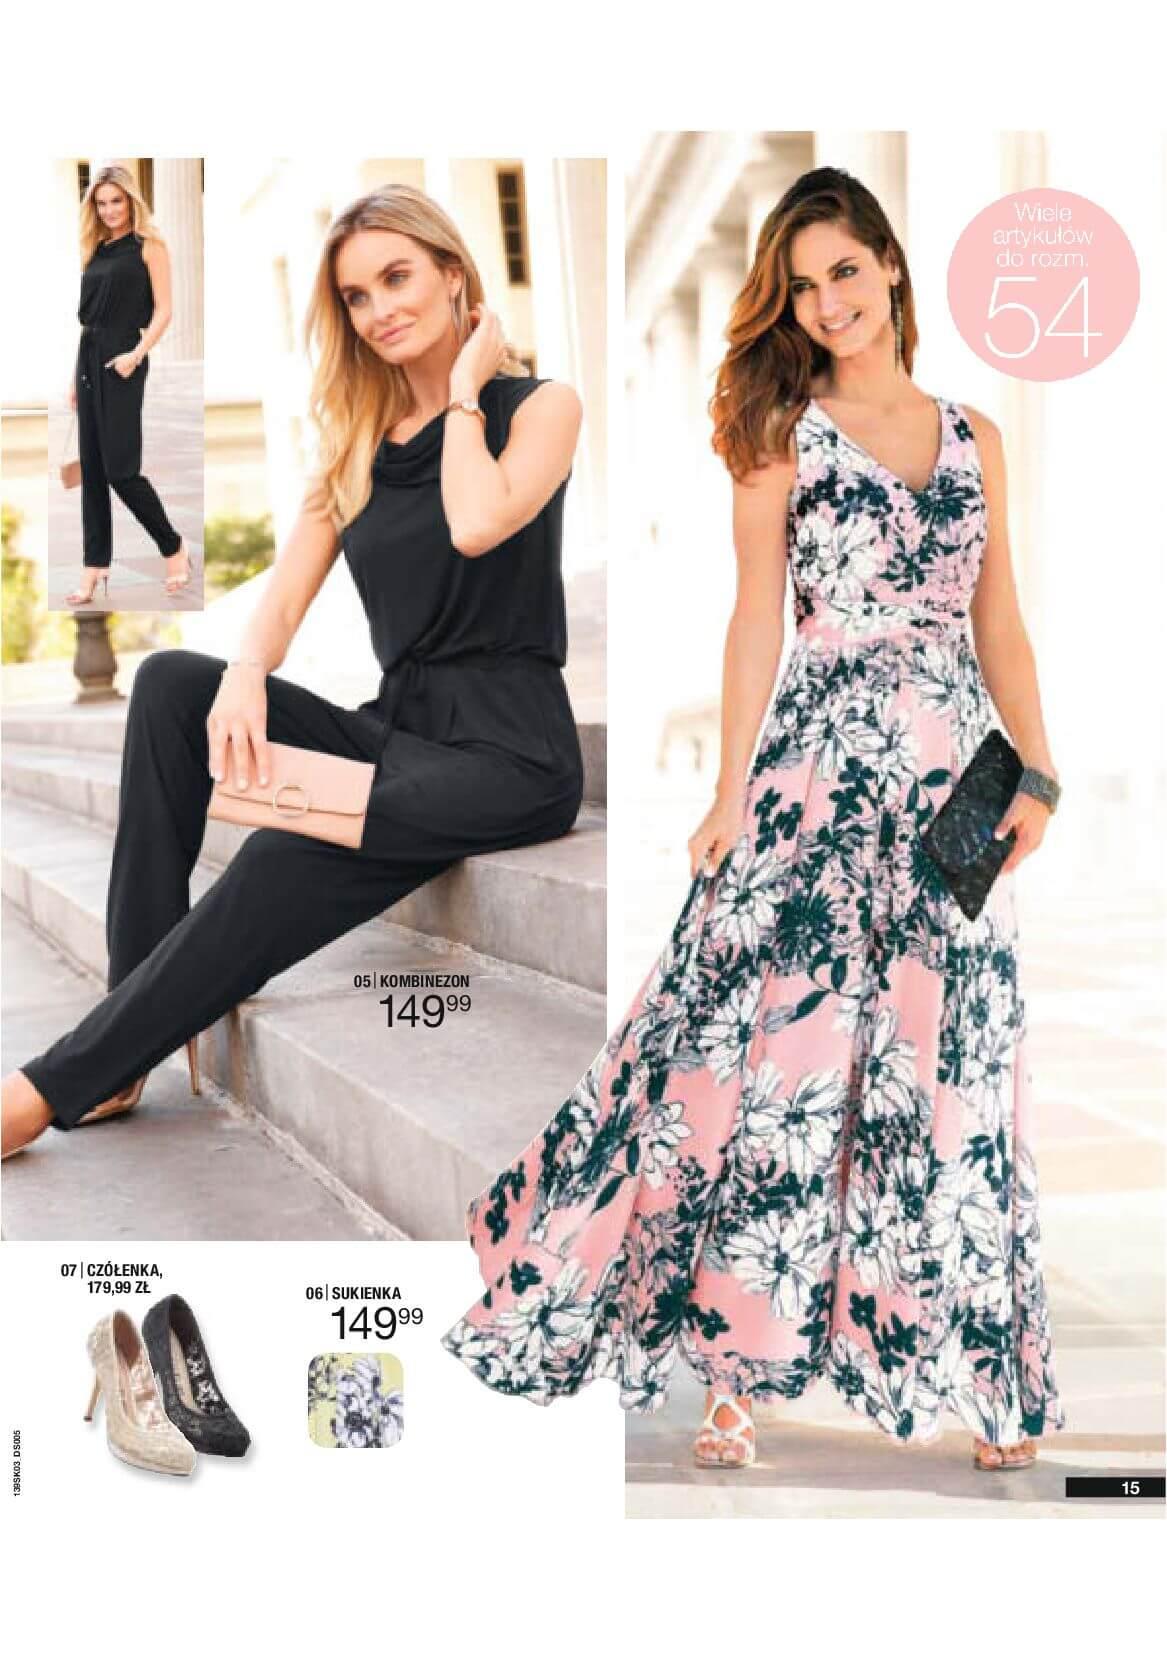 Gazetka Bonprix - Radosna moda-10.03.2019-25.06.2019-page-17